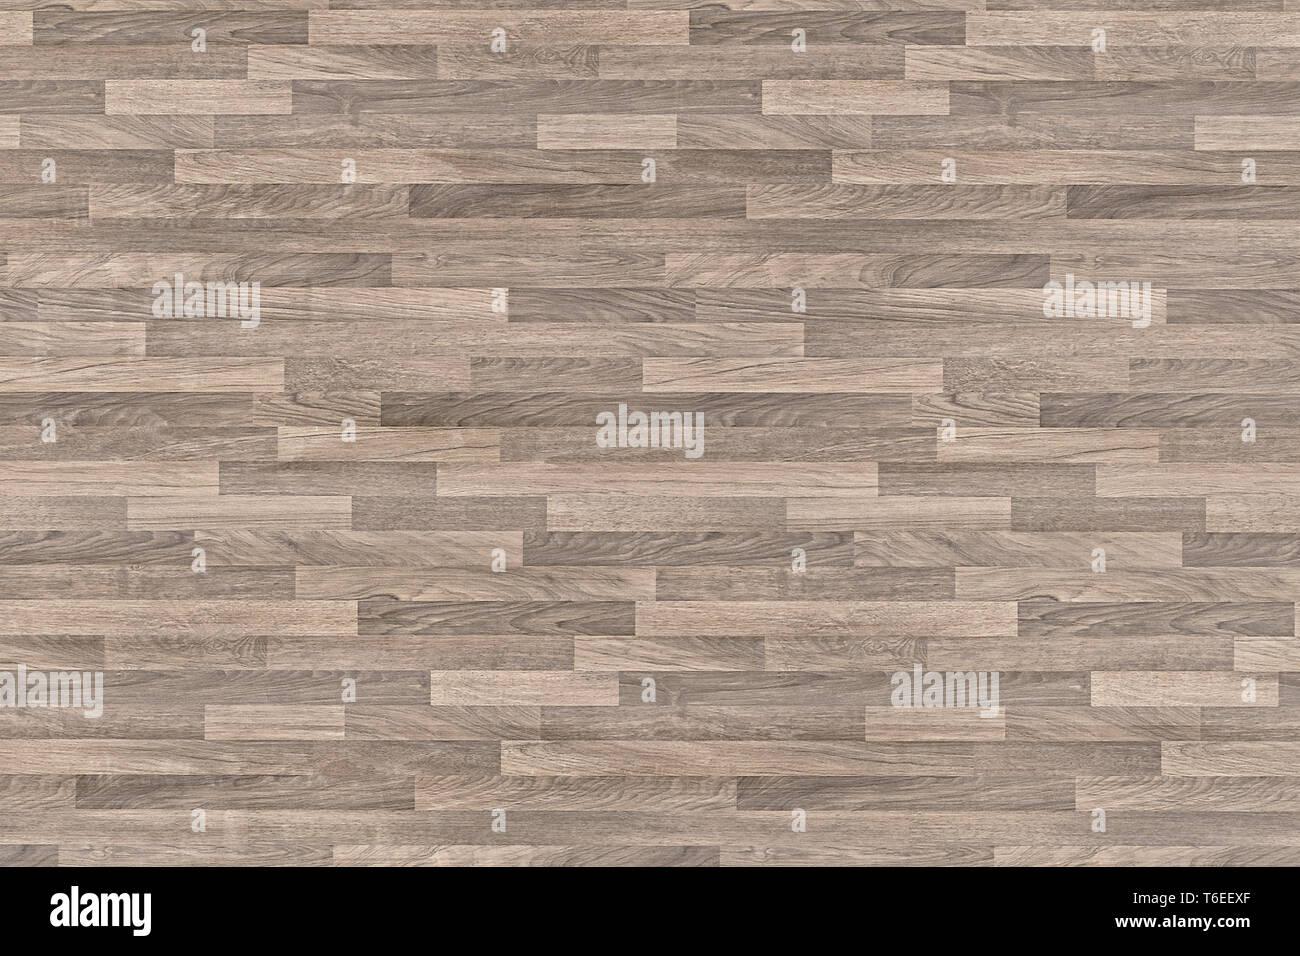 Laminate parquet flooring. Light wooden texture background. - Stock Image